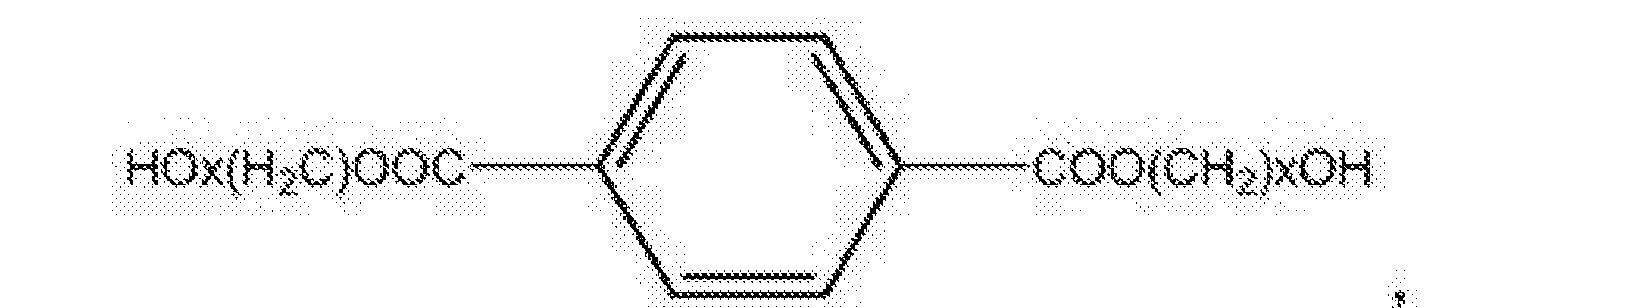 Figure CN106893640AD00062